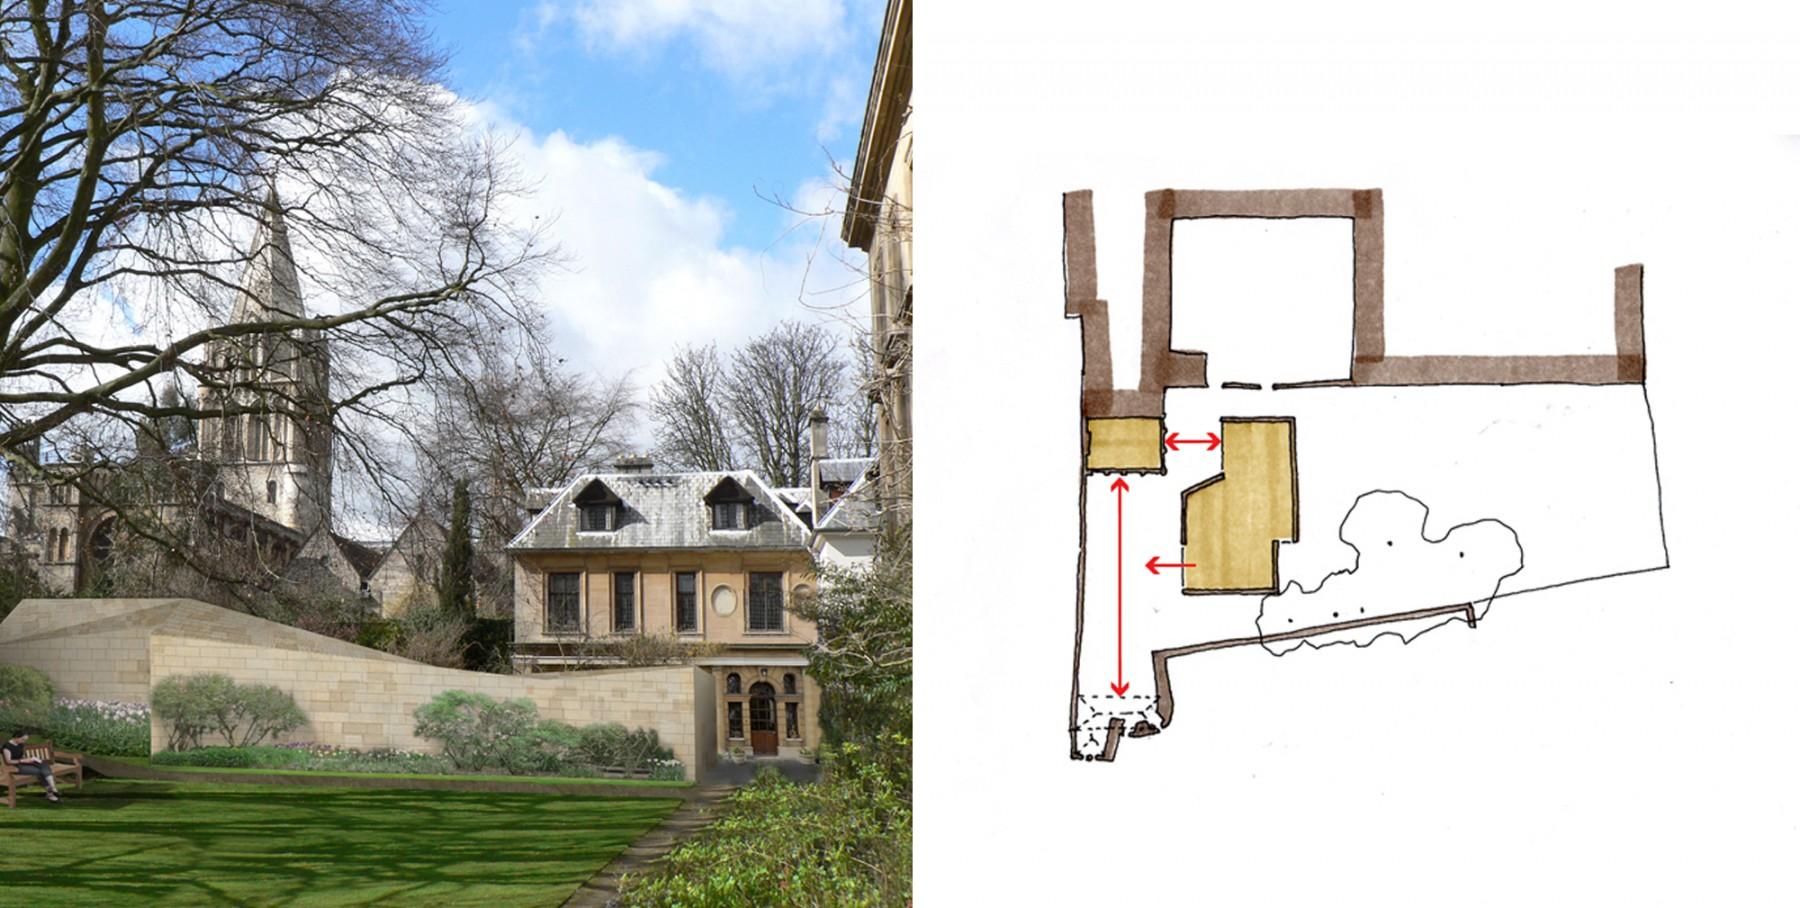 University-oxford-corpus-christie-music-room-Centre-short-list-education-Fellows-Garden-Jamie-Fobert-architects-2